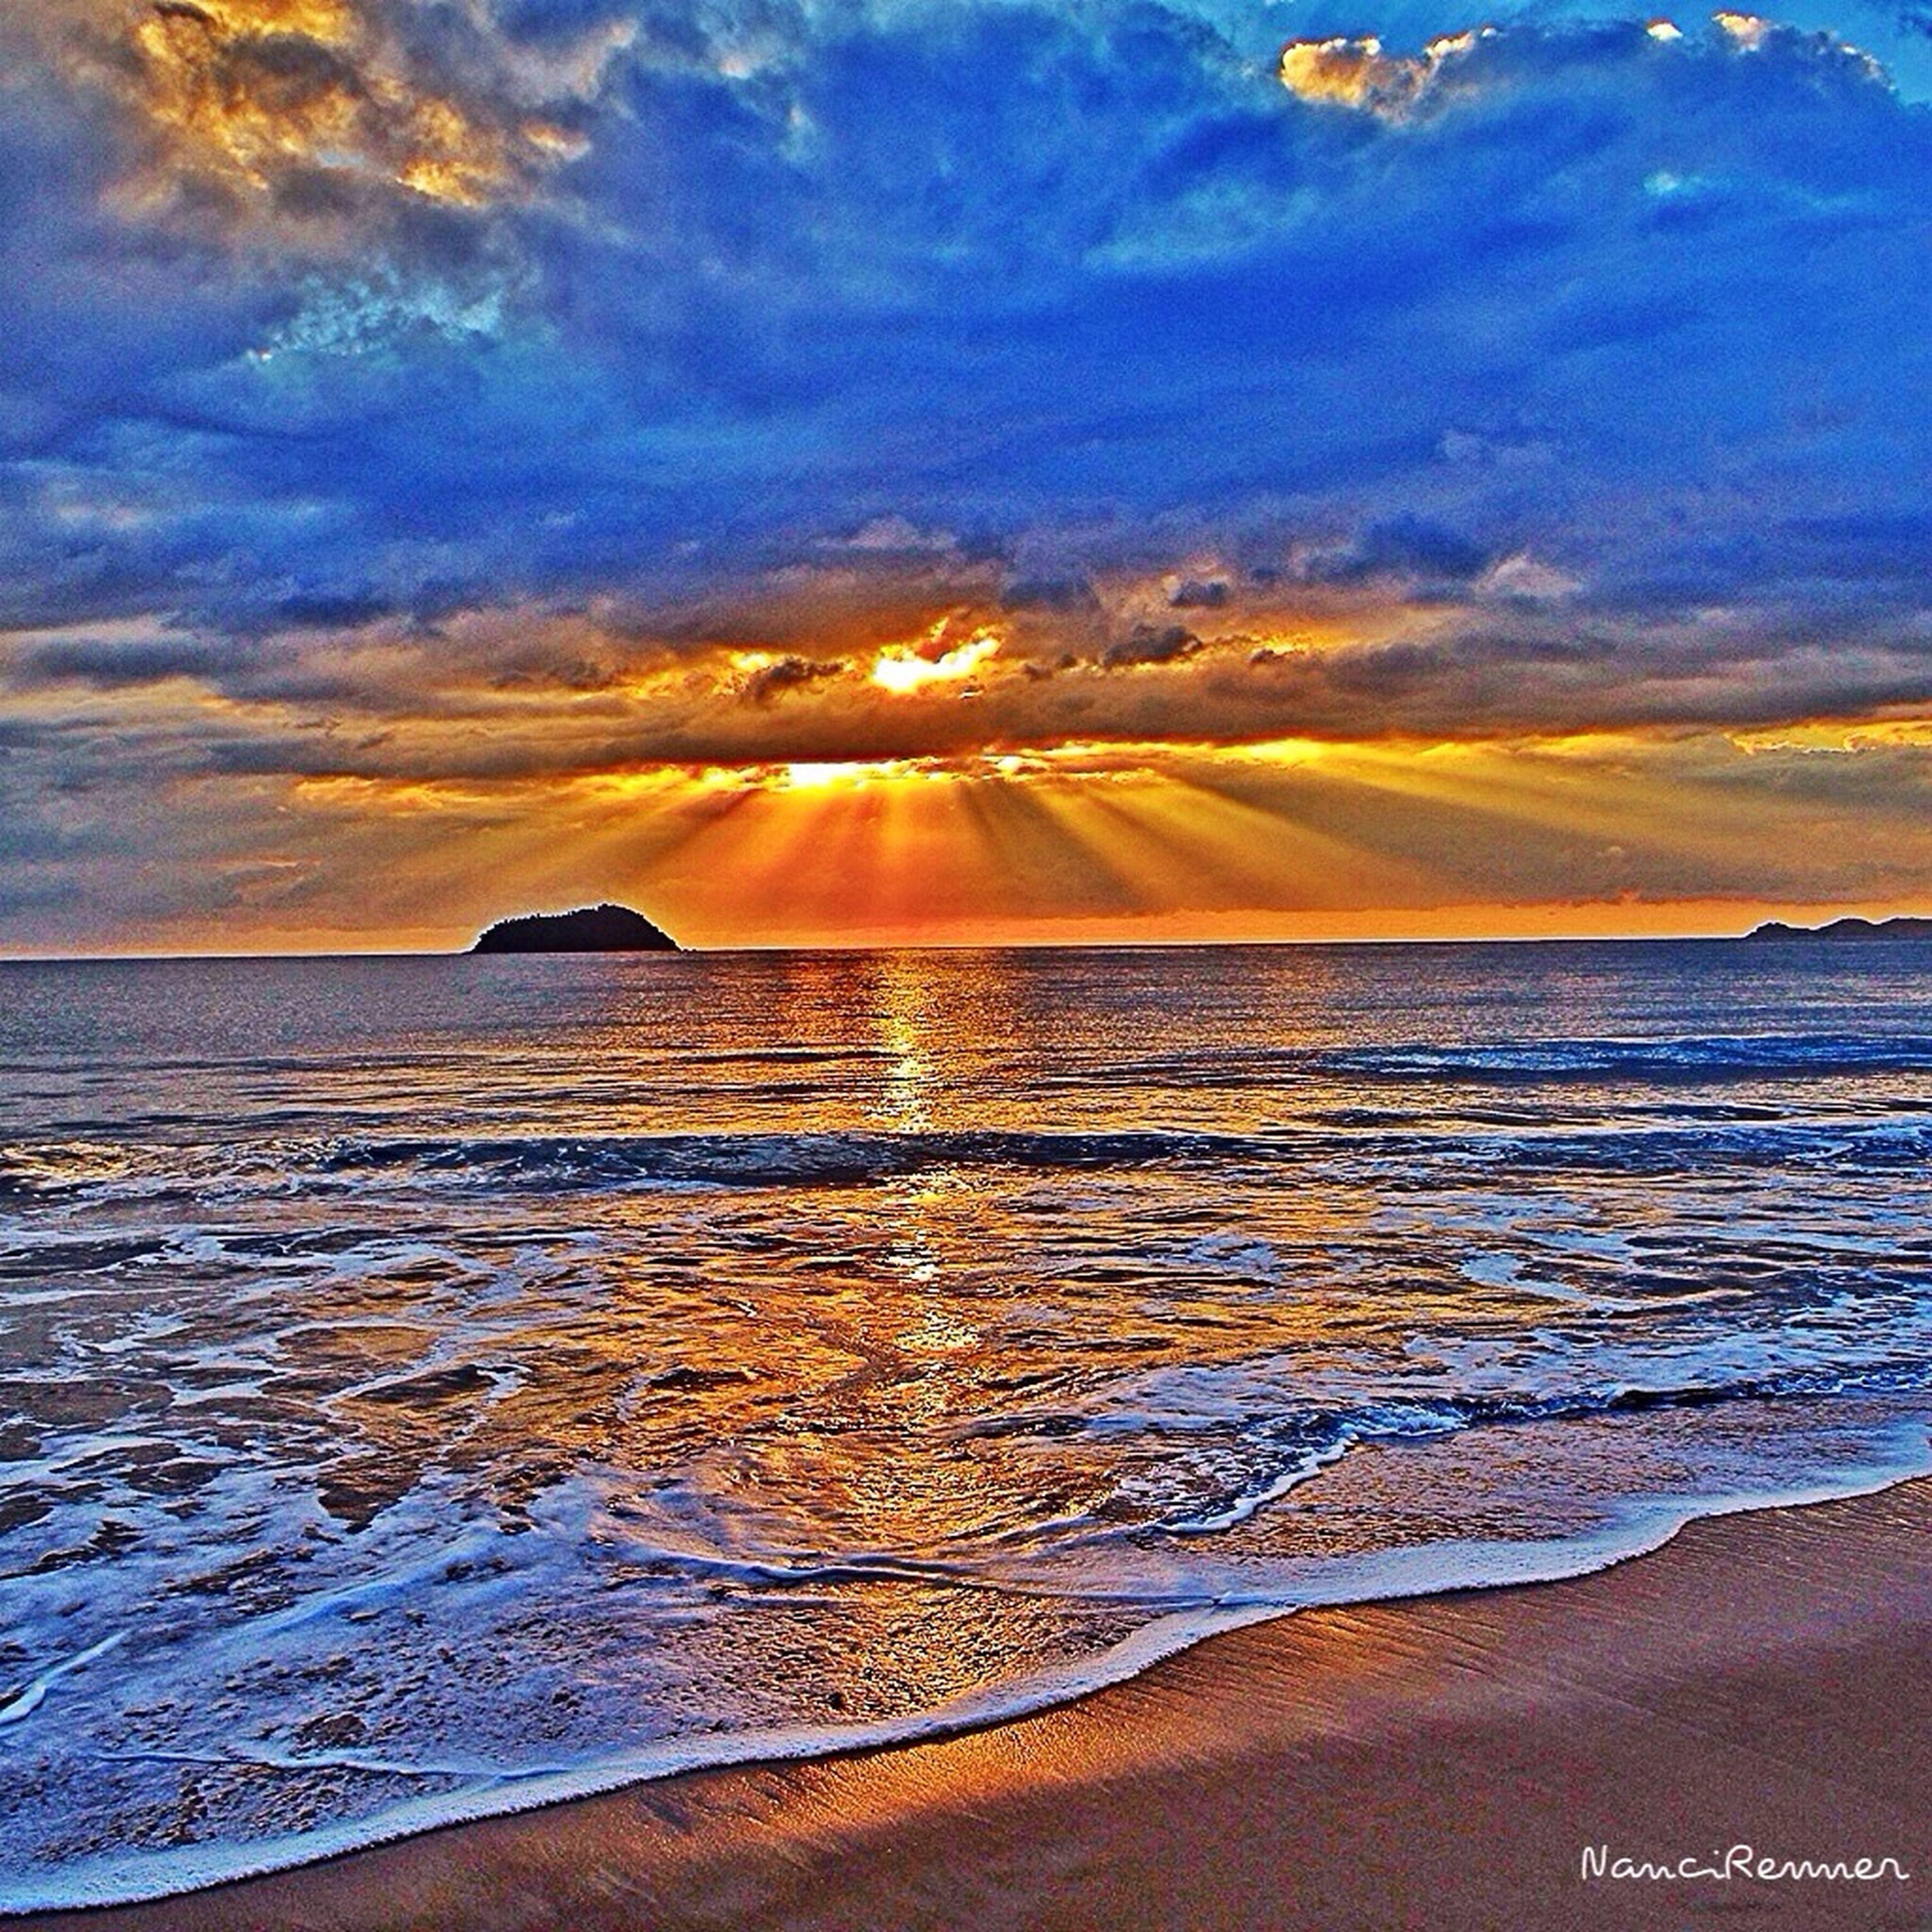 scenics, sea, beauty in nature, tranquil scene, sunset, tranquility, water, sky, beach, nature, idyllic, cloud - sky, horizon over water, orange color, mountain, shore, sand, wave, cloud, non-urban scene